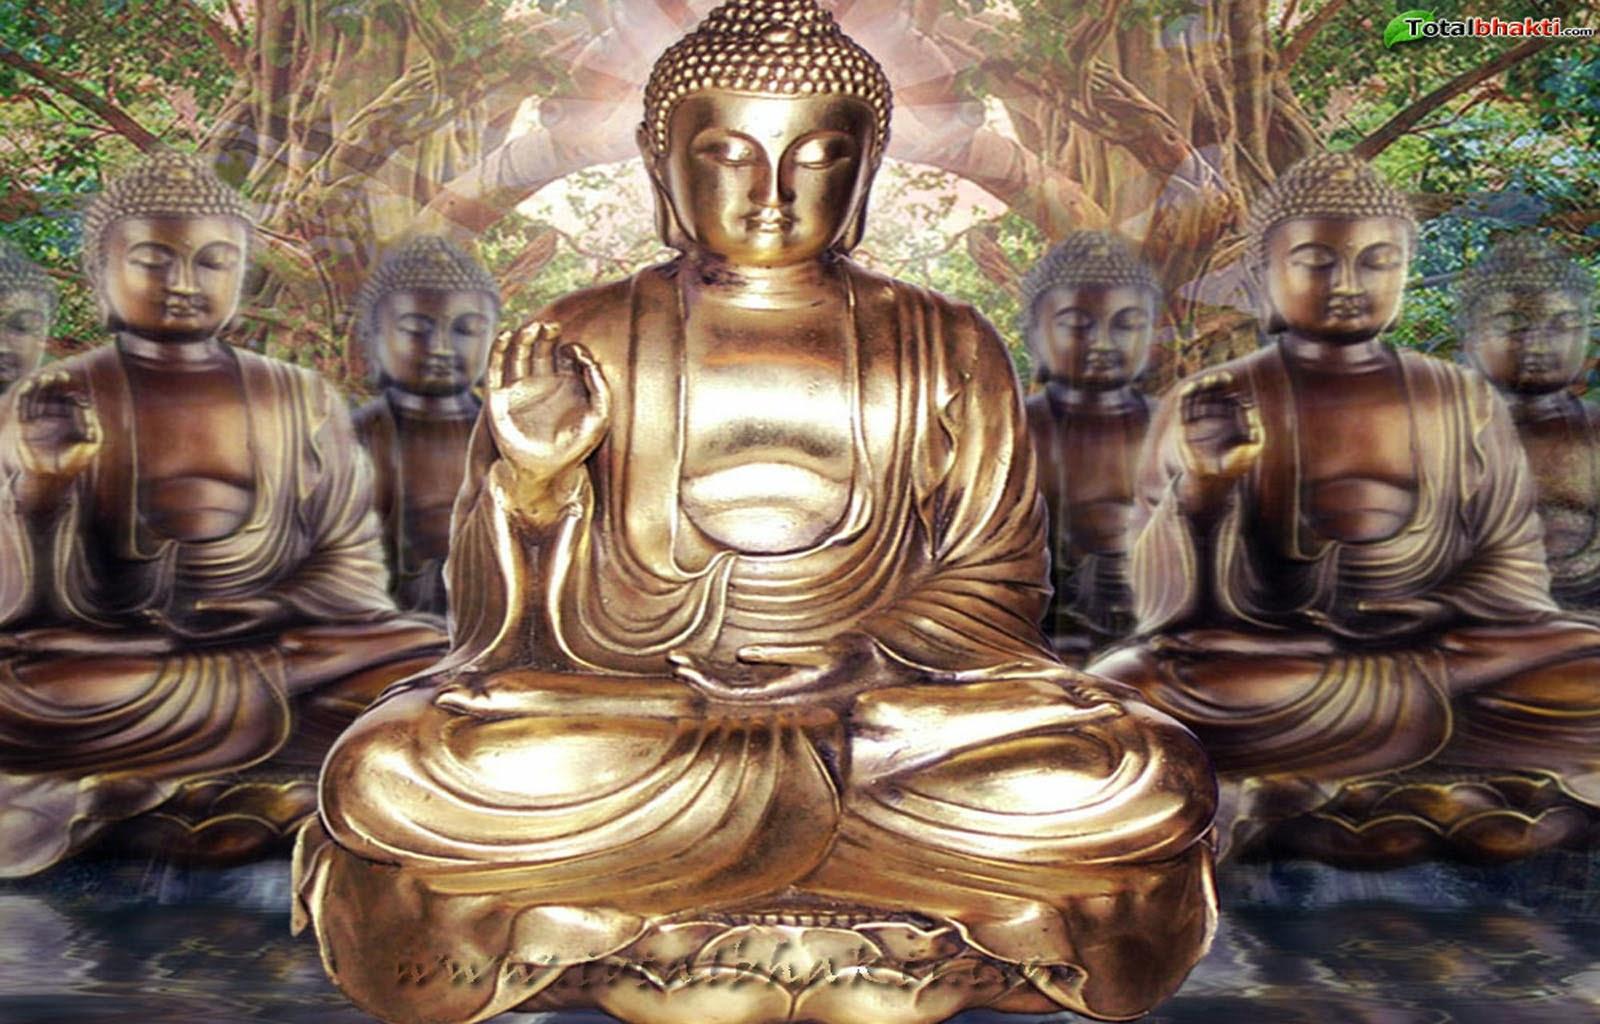 bhagwan ji help me  lord gautam buddha wallpapers gallery